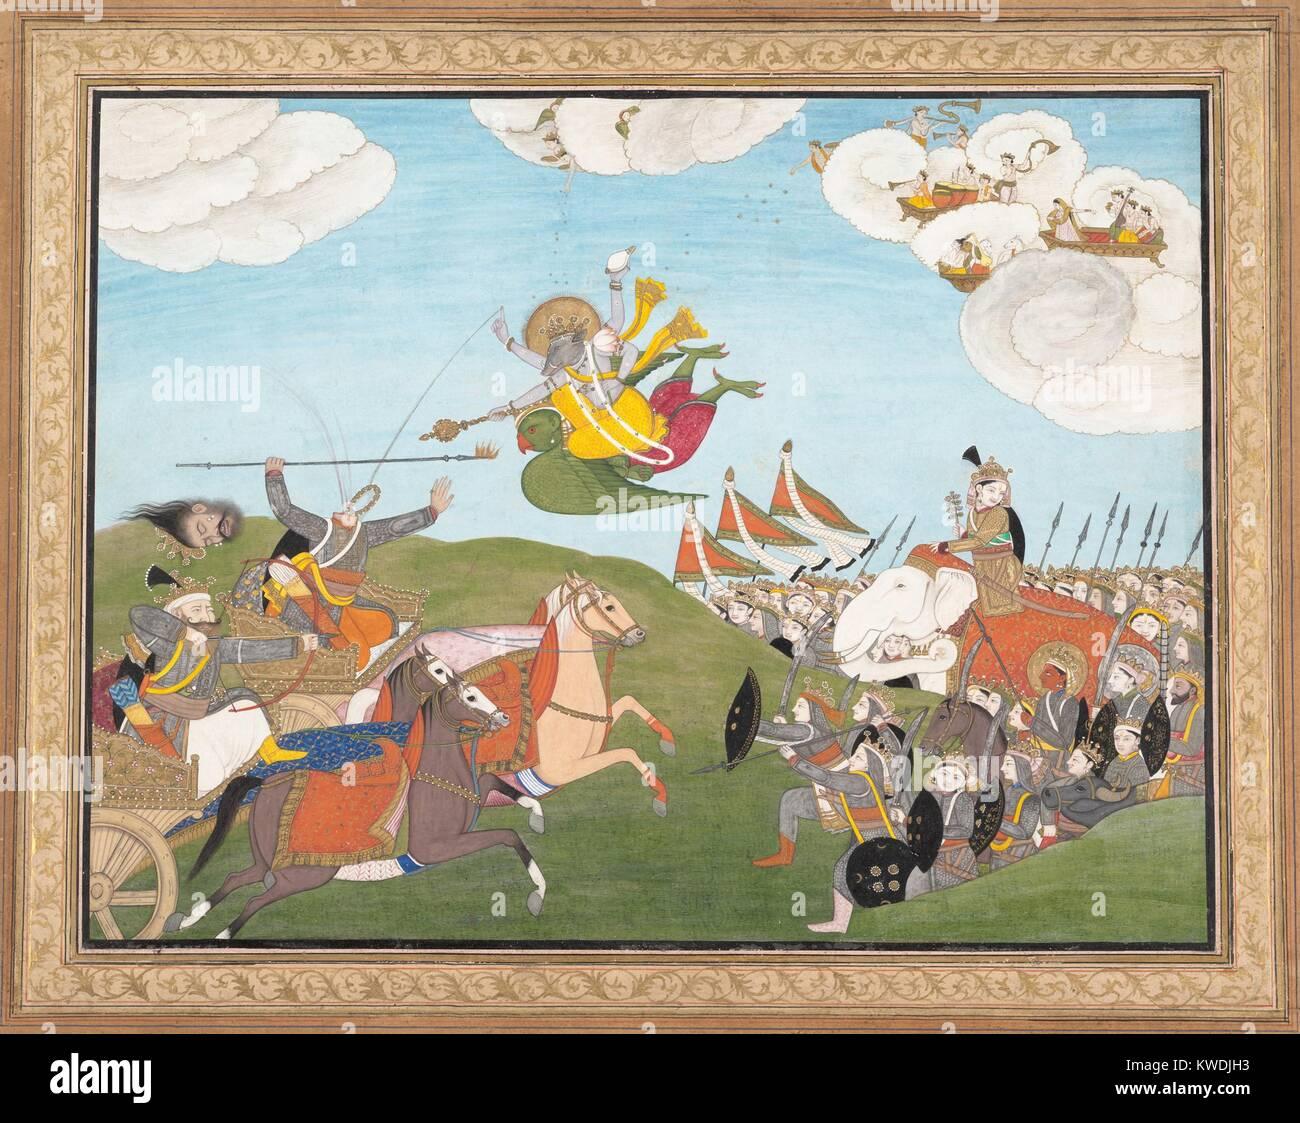 VISHNU AS VARAHA, THE BOAR AVATAR, SLAYS BANASUR, A DEMON GENERAL, 19th c., Hindu, painting. Indian ink and watercolor - Stock Image